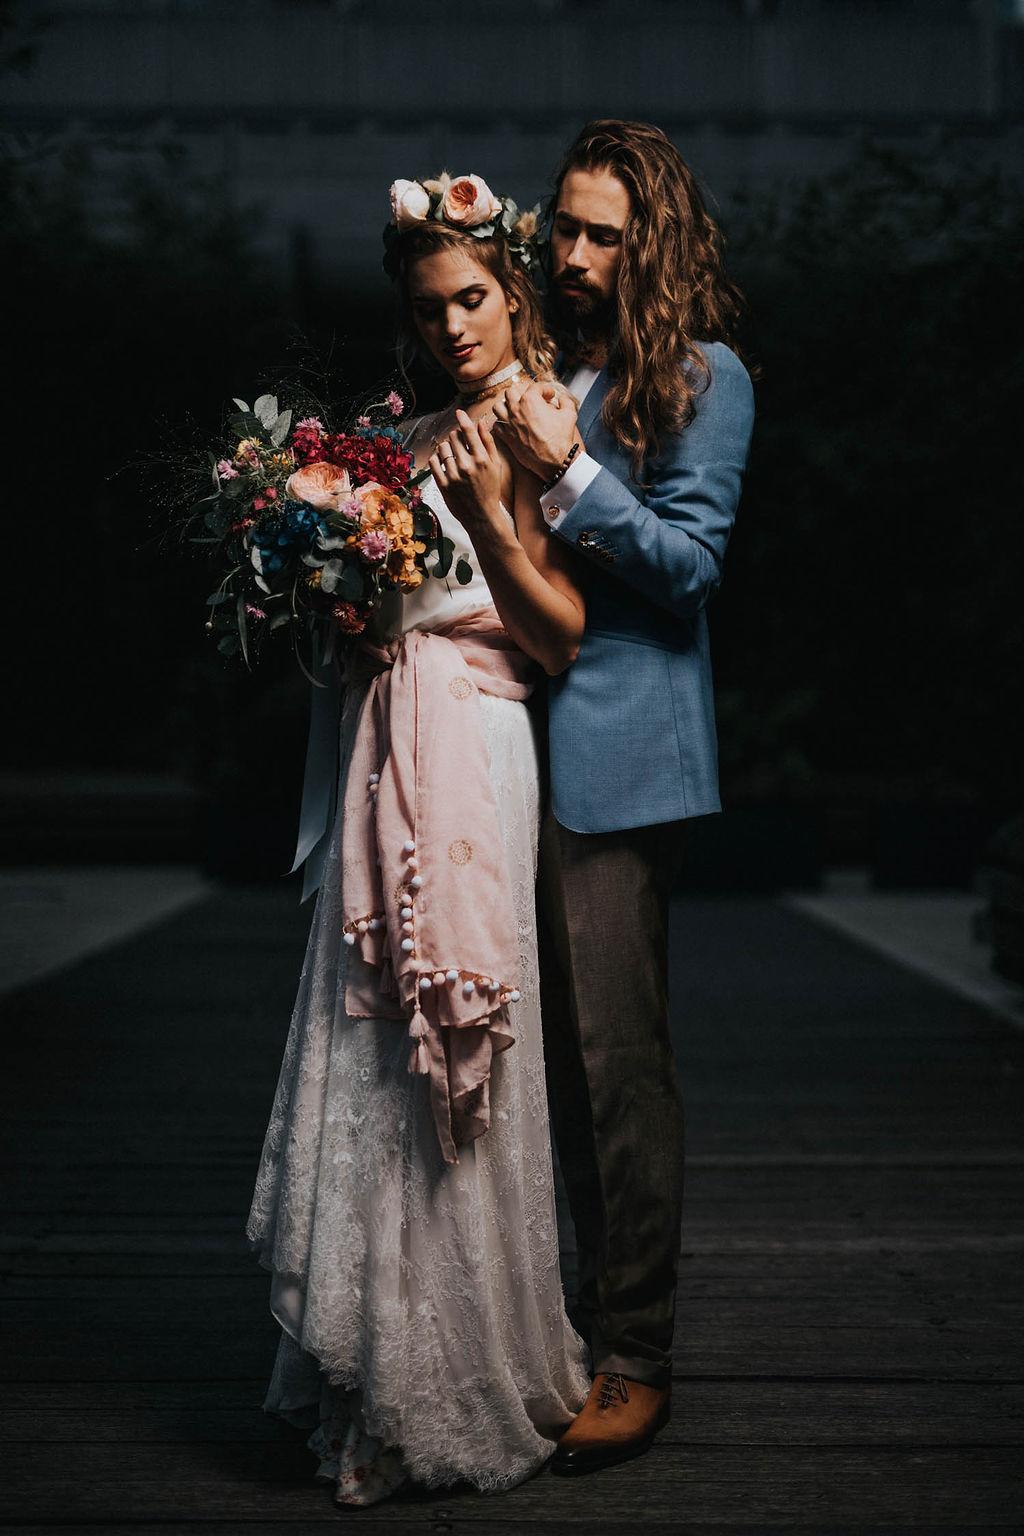 2_23_boheme_couple_4_looks_sidneyonthemoon_photographe_chrisvonmartial_robe_mariee_costume_paris_wedding_web.jpg